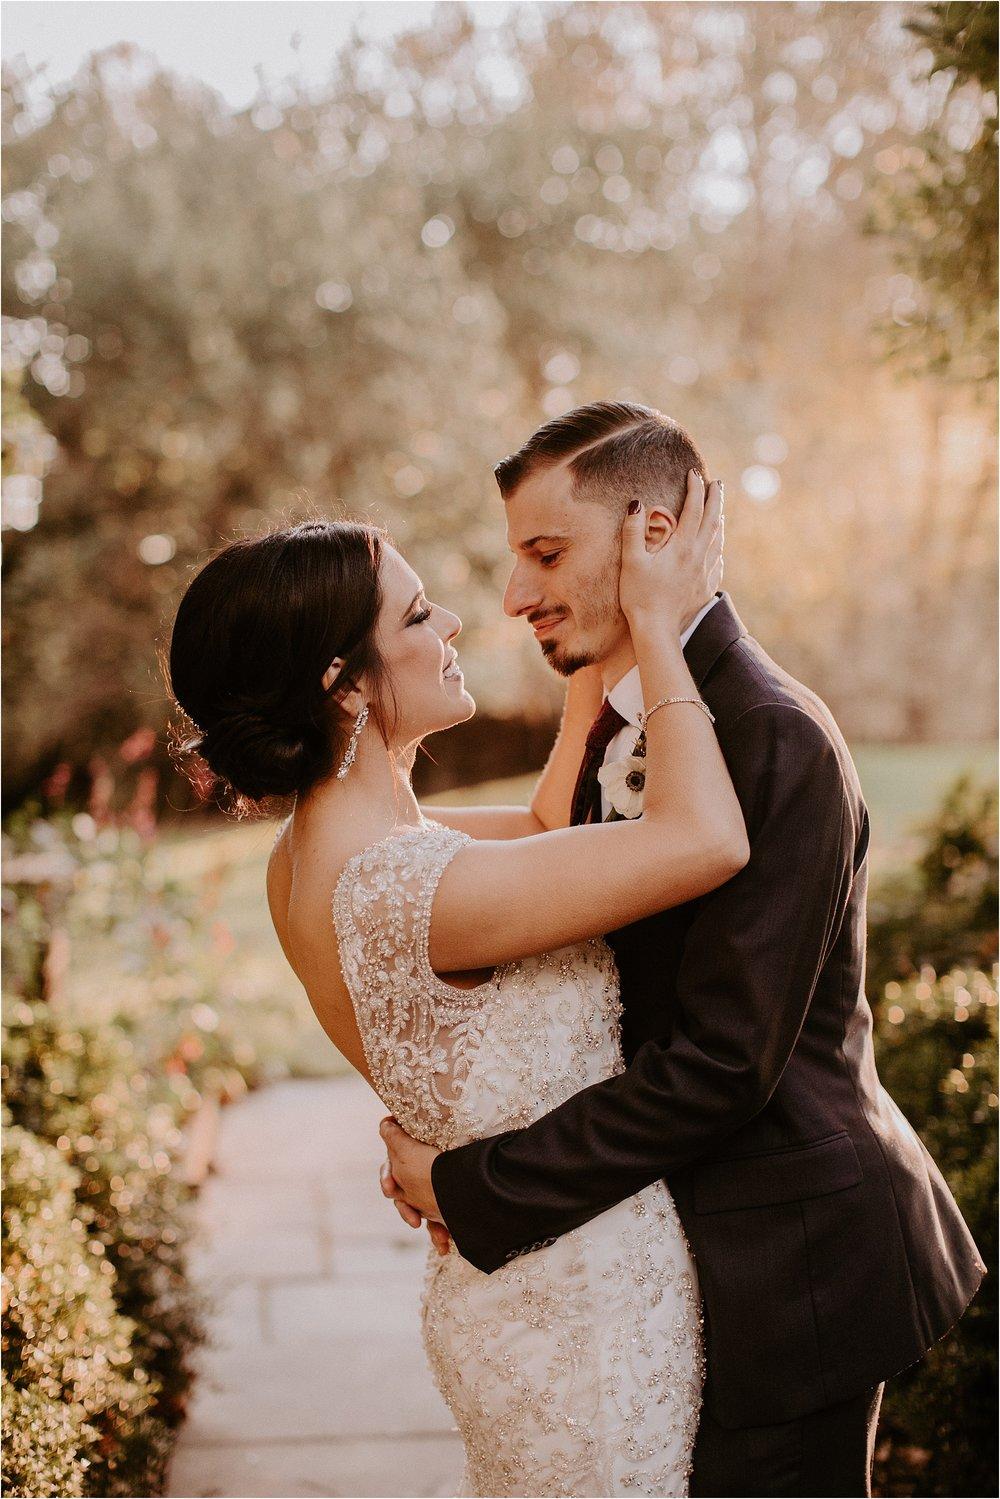 Sarah_Brookhart_Philadelphia_Wedding_Photographer_0047.jpg